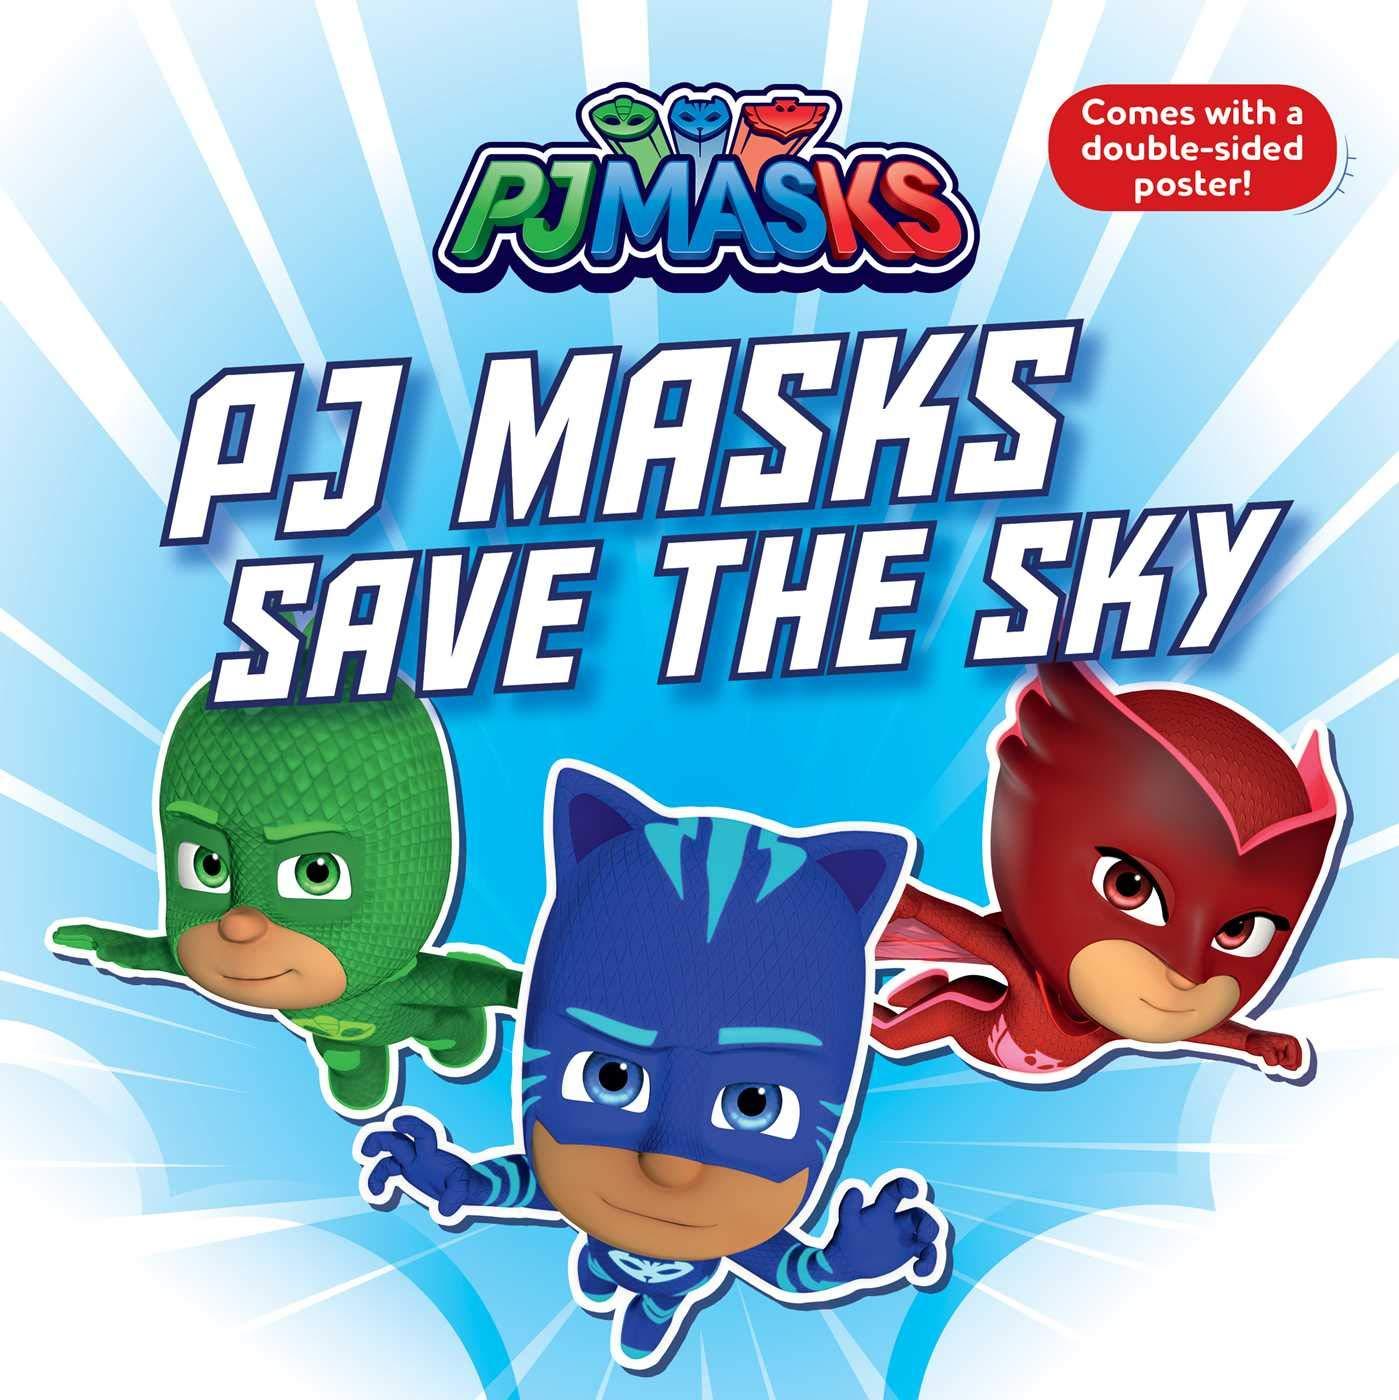 Pj Masks Save the Sky: Amazon.es: Michaels, Patty: Libros en ...